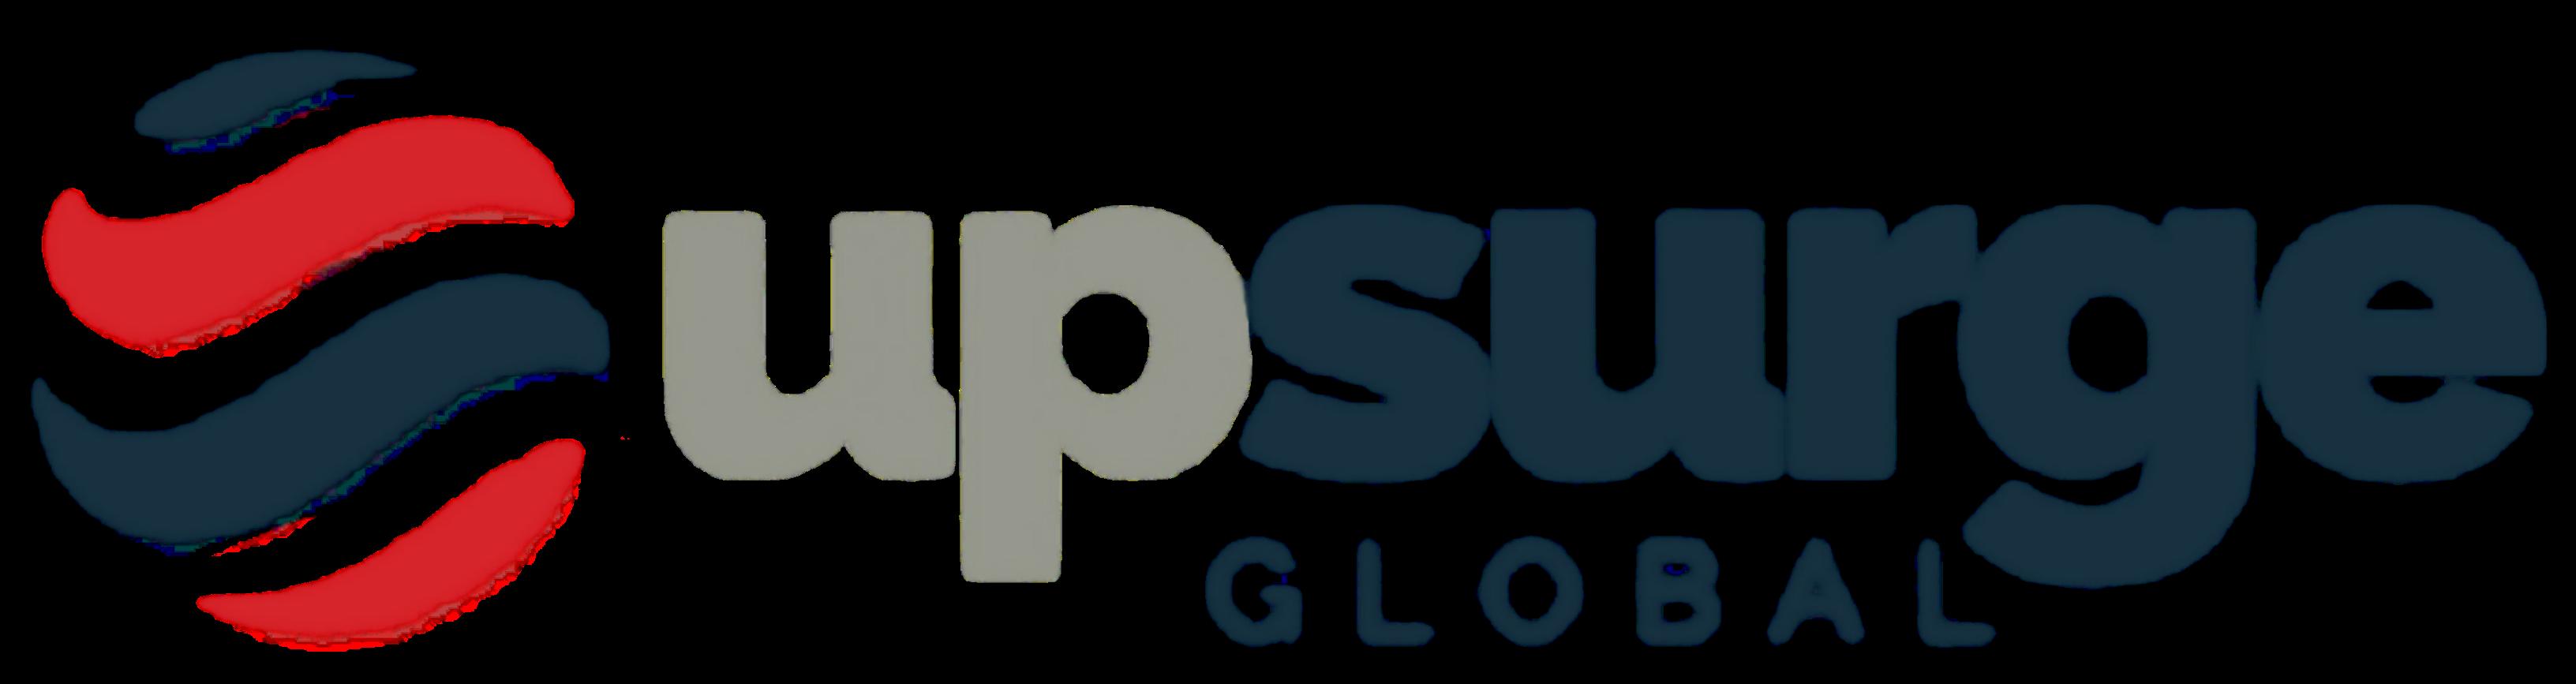 Upsurge Global